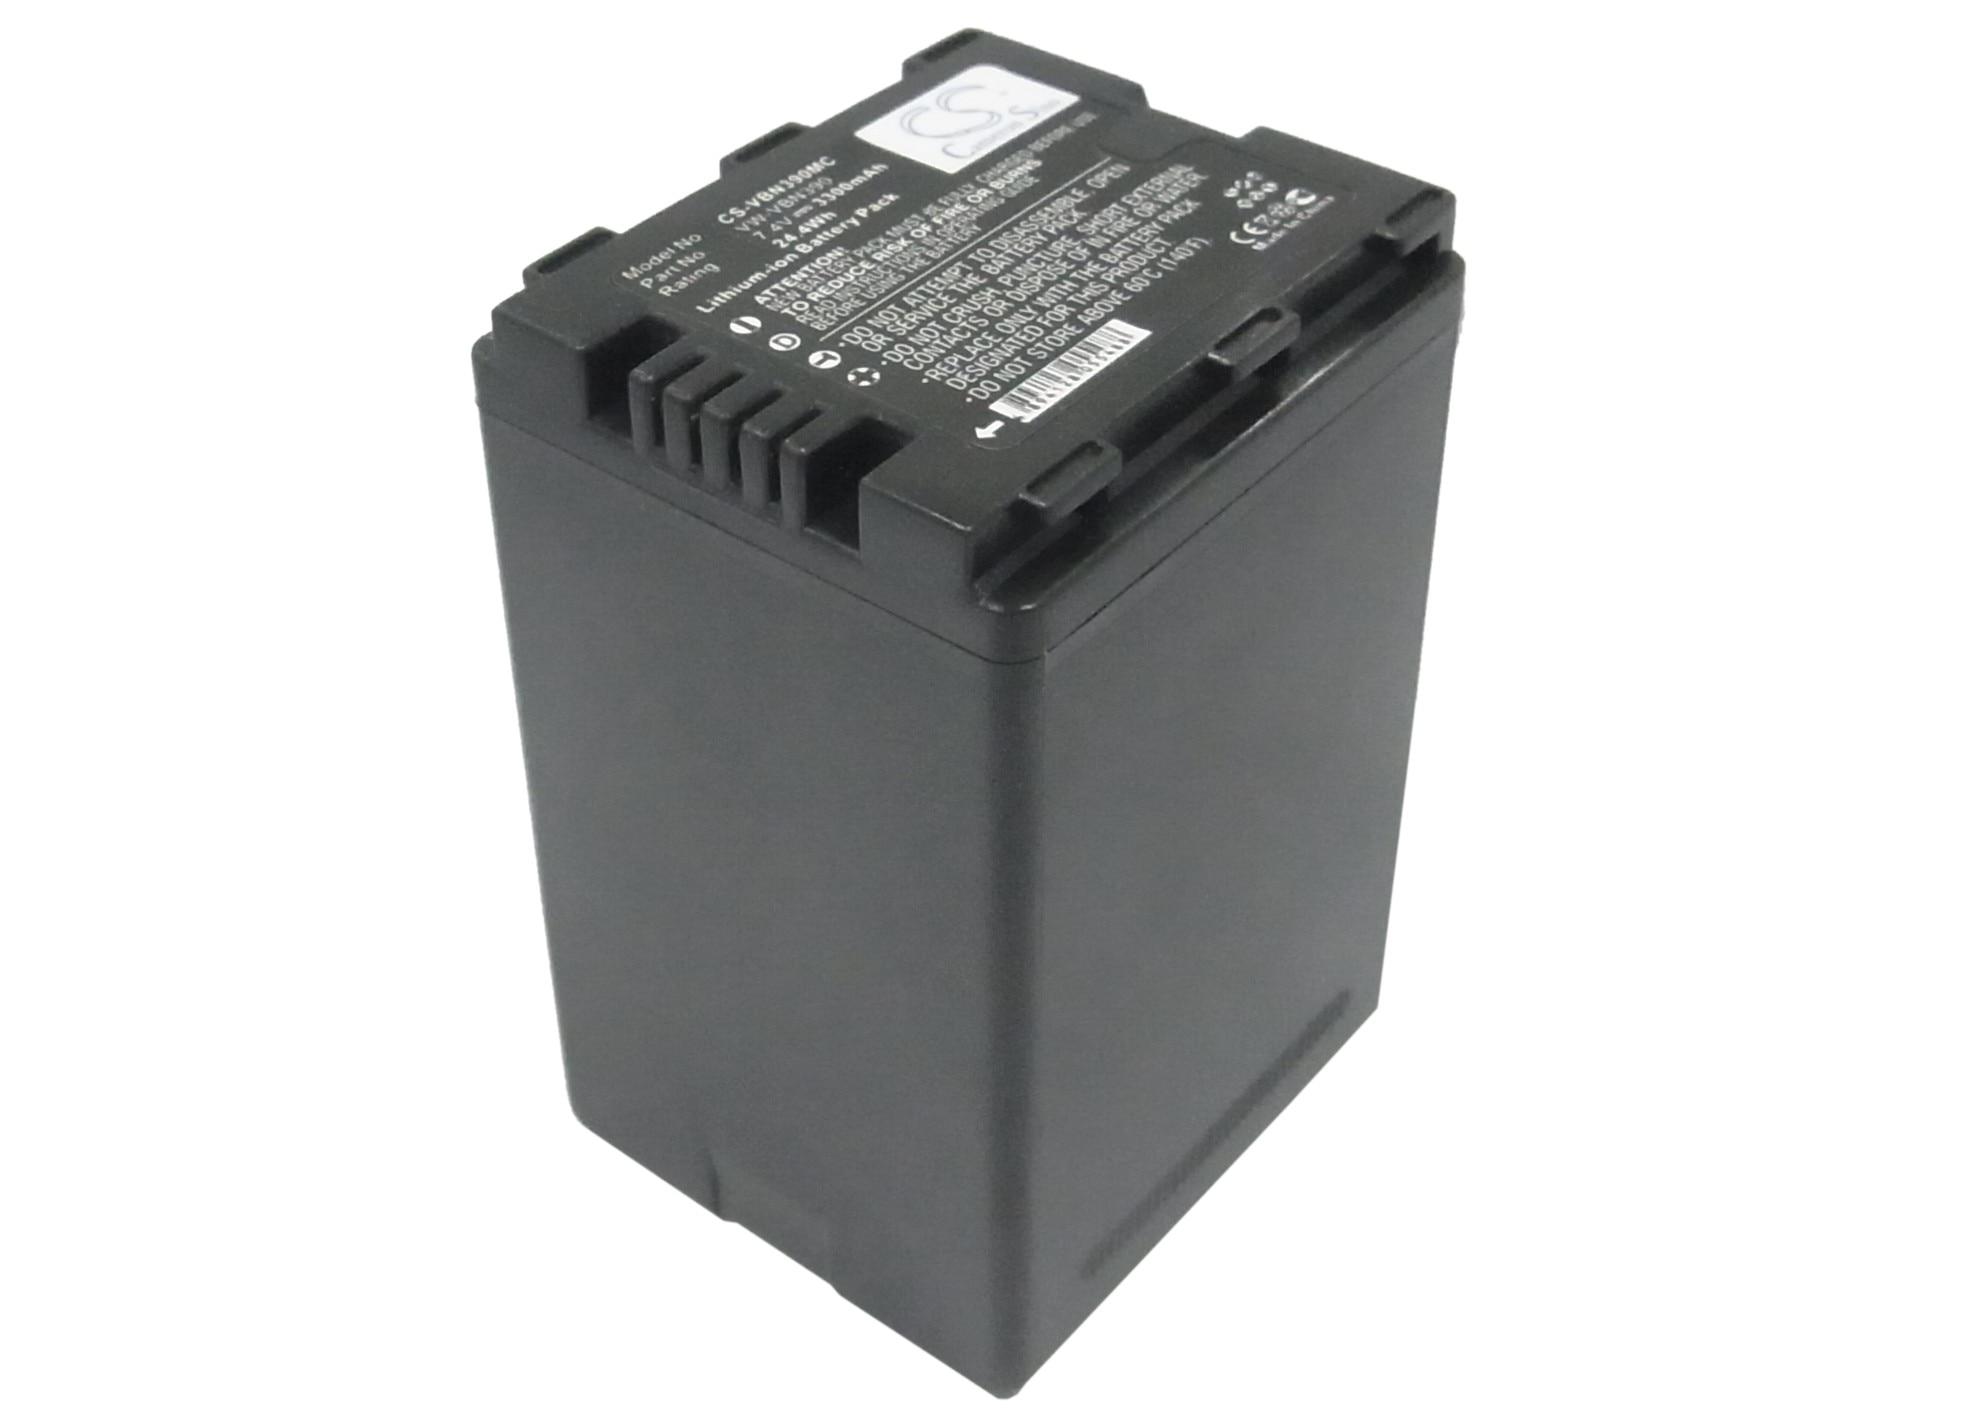 Cameron Sino Battery For Panasonic HC X900,HC X900M,HC X920,HDC HS900,HDC SD800